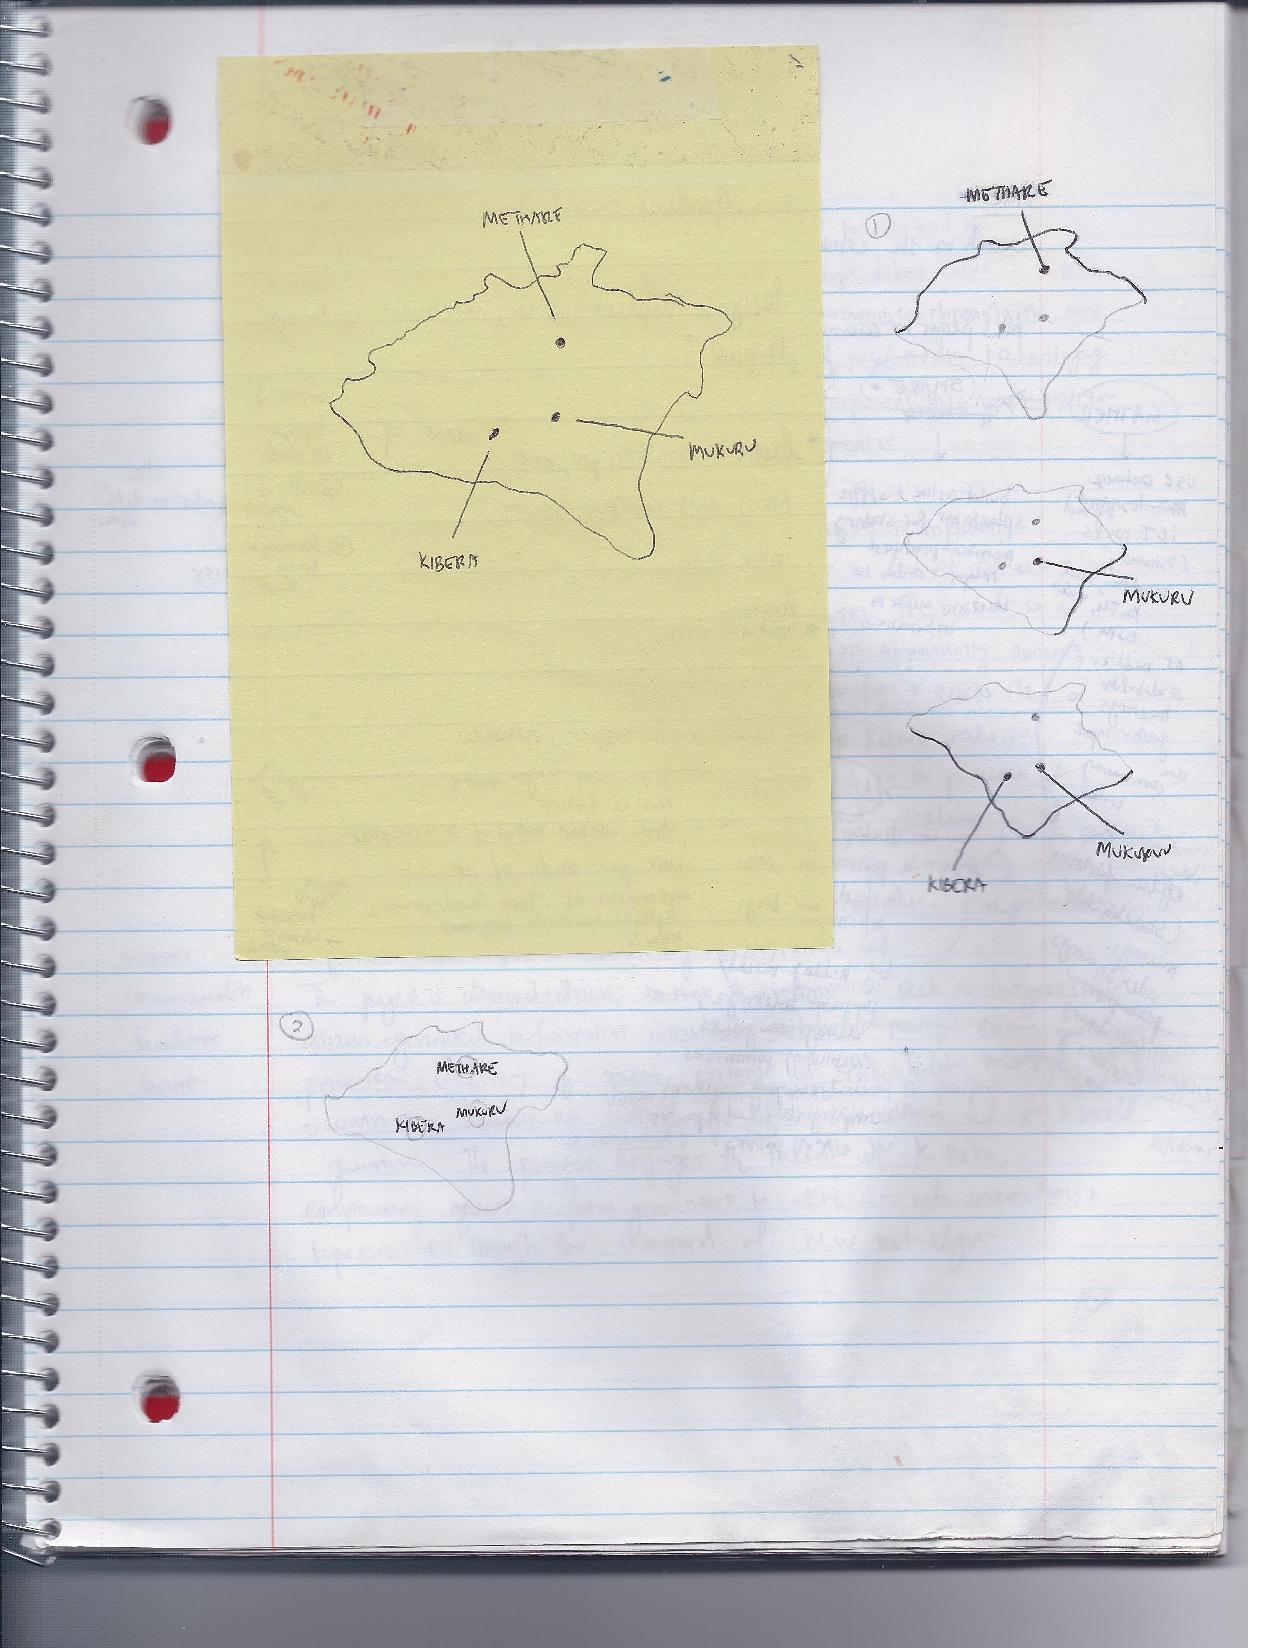 MK location soln-page-001.jpg